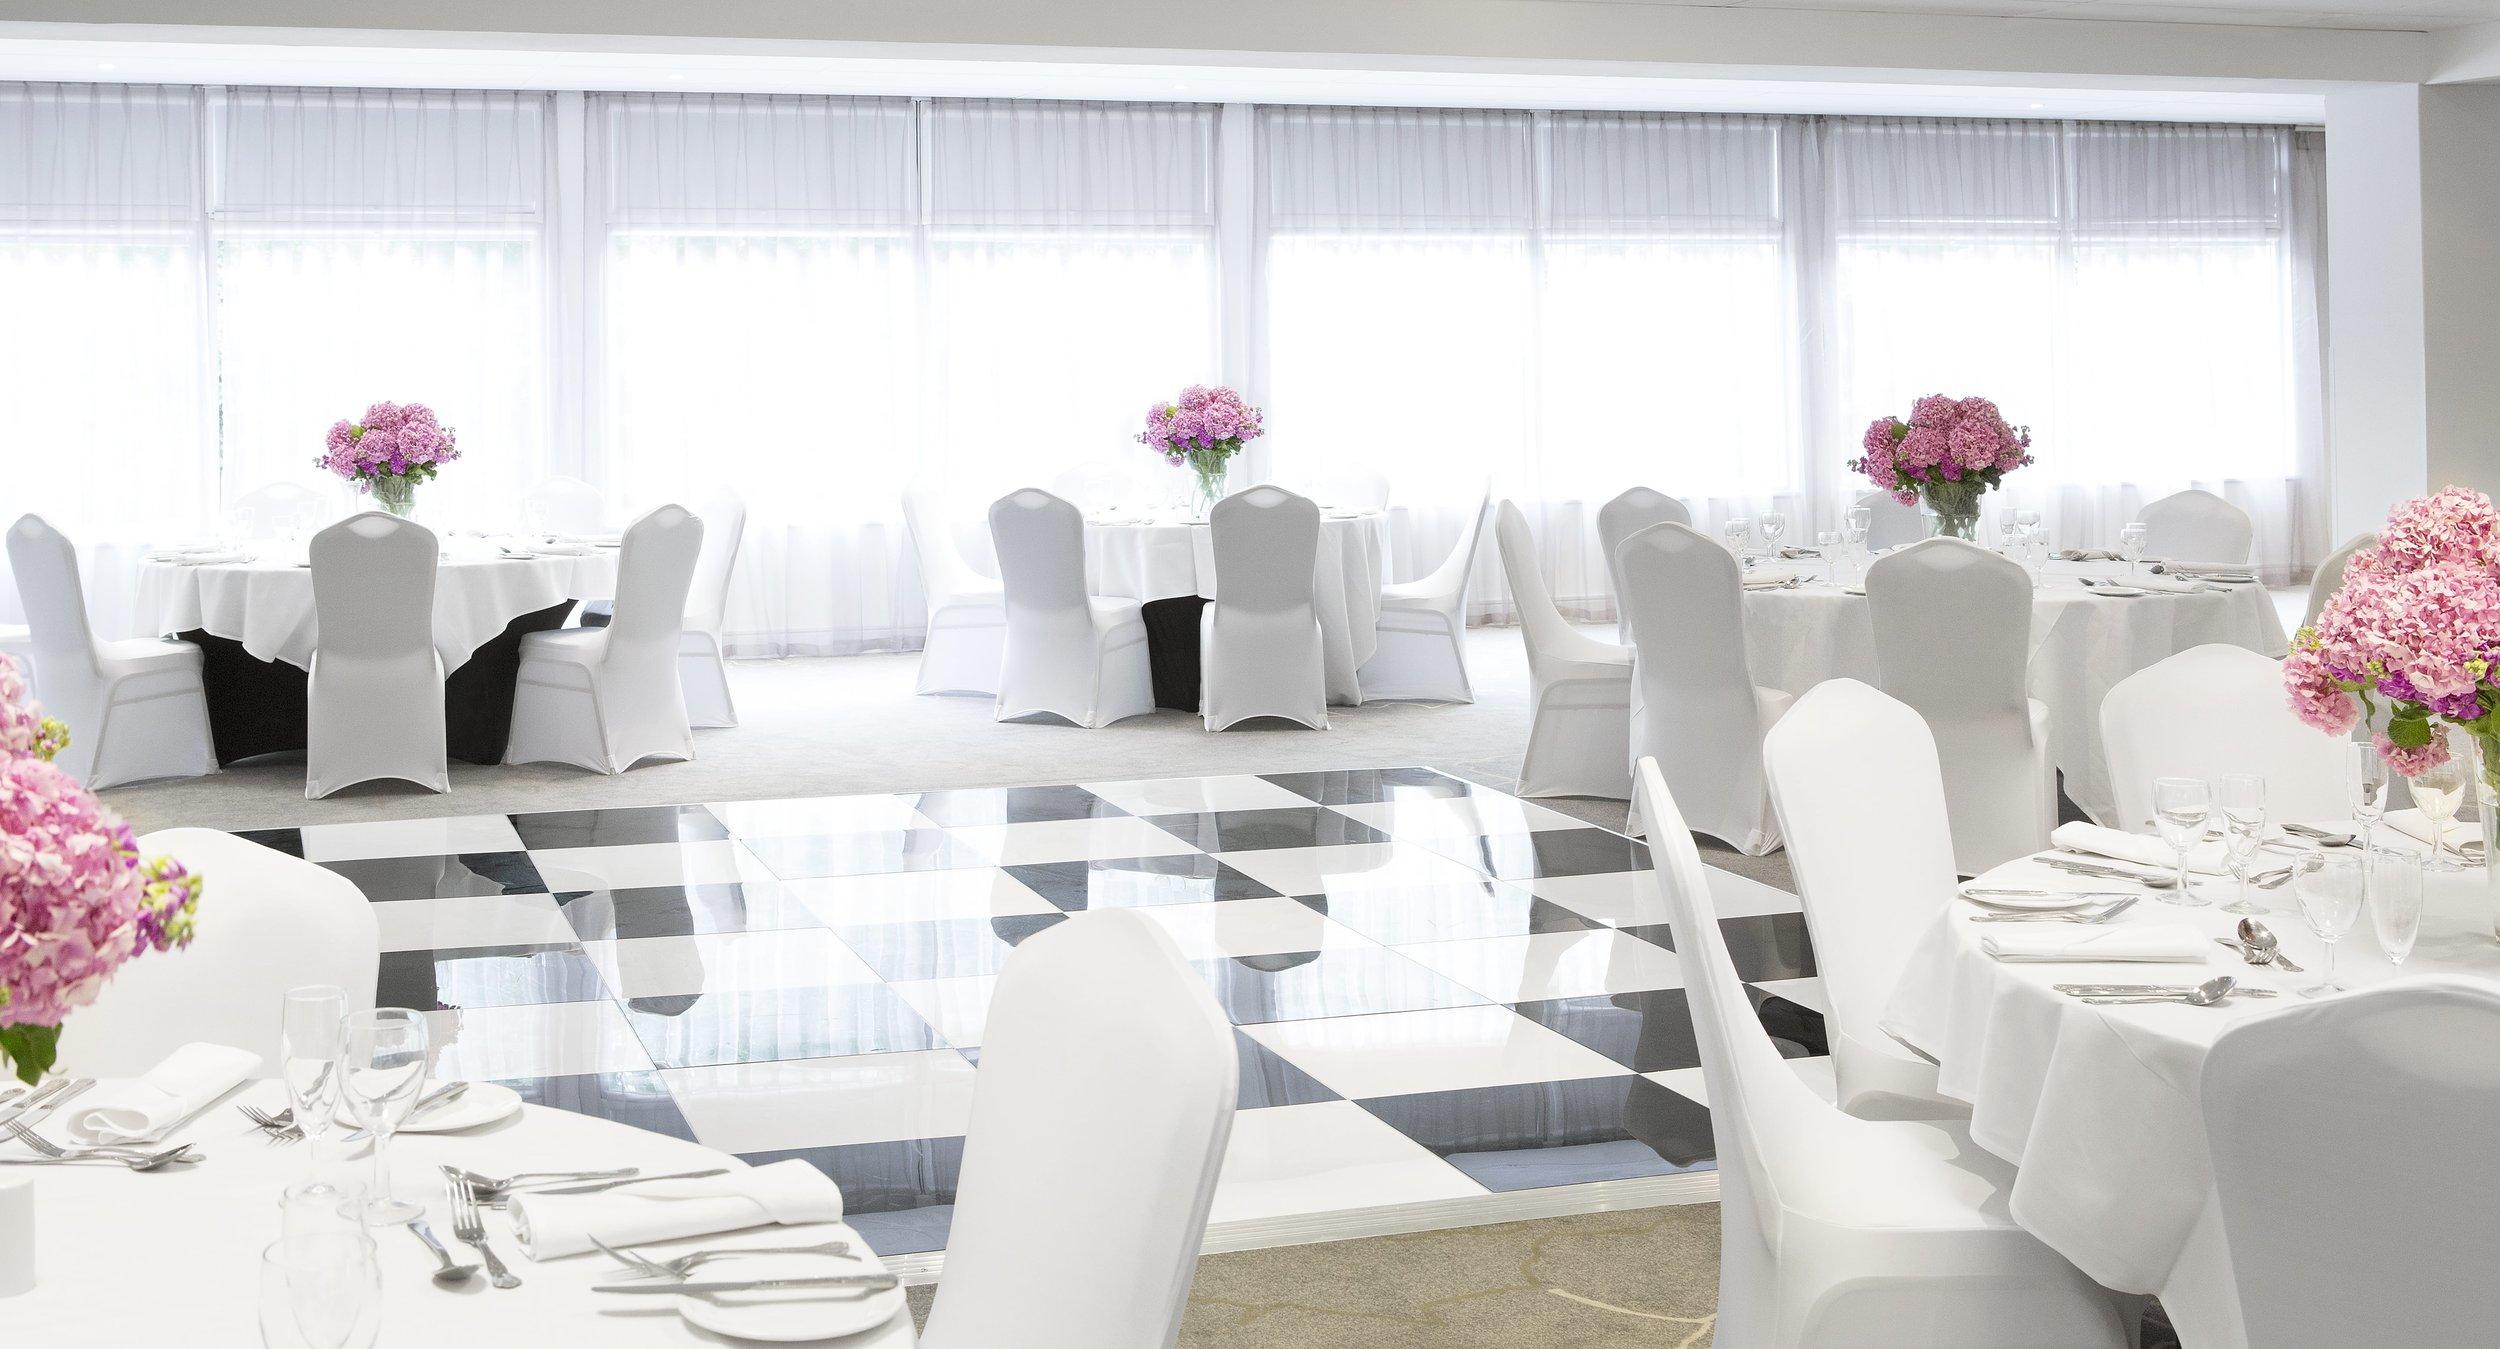 Wedding-Banquet-Room-min.jpg